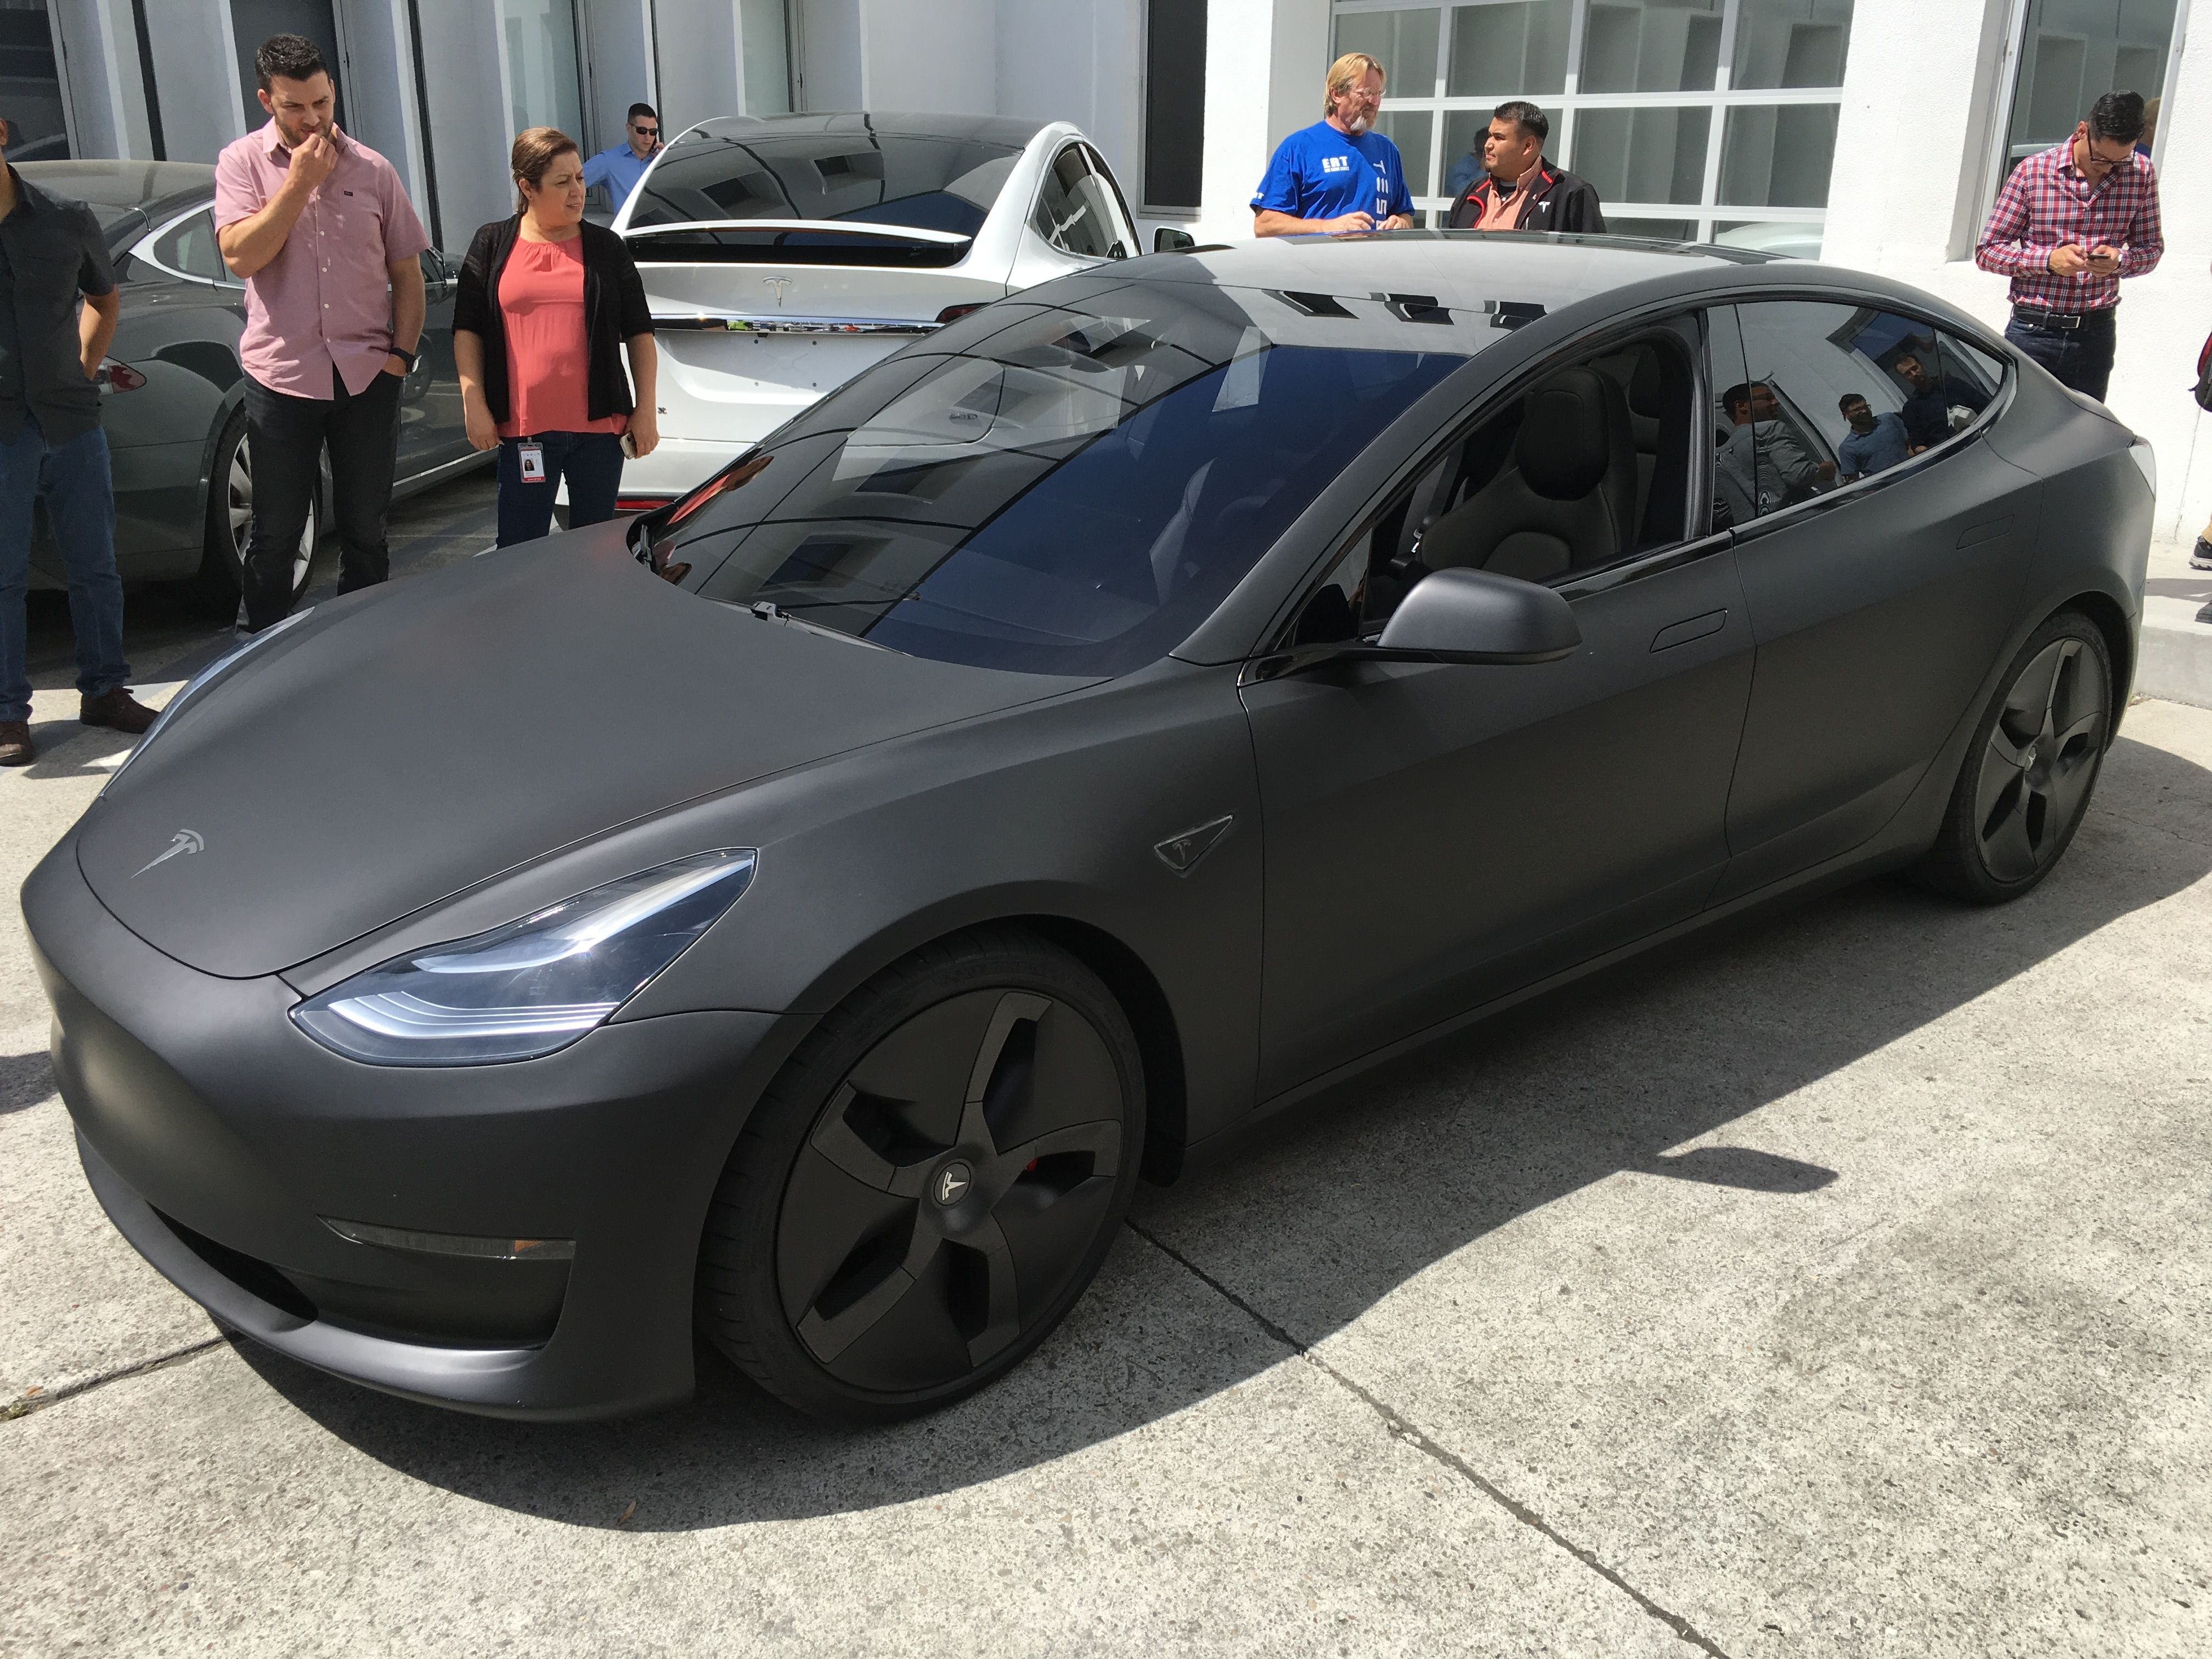 Design of tesla car - Best 25 Tesla Electric Ideas On Pinterest Tesla Motors Le P85 Du Mod Le Tesla And Tesla Model S